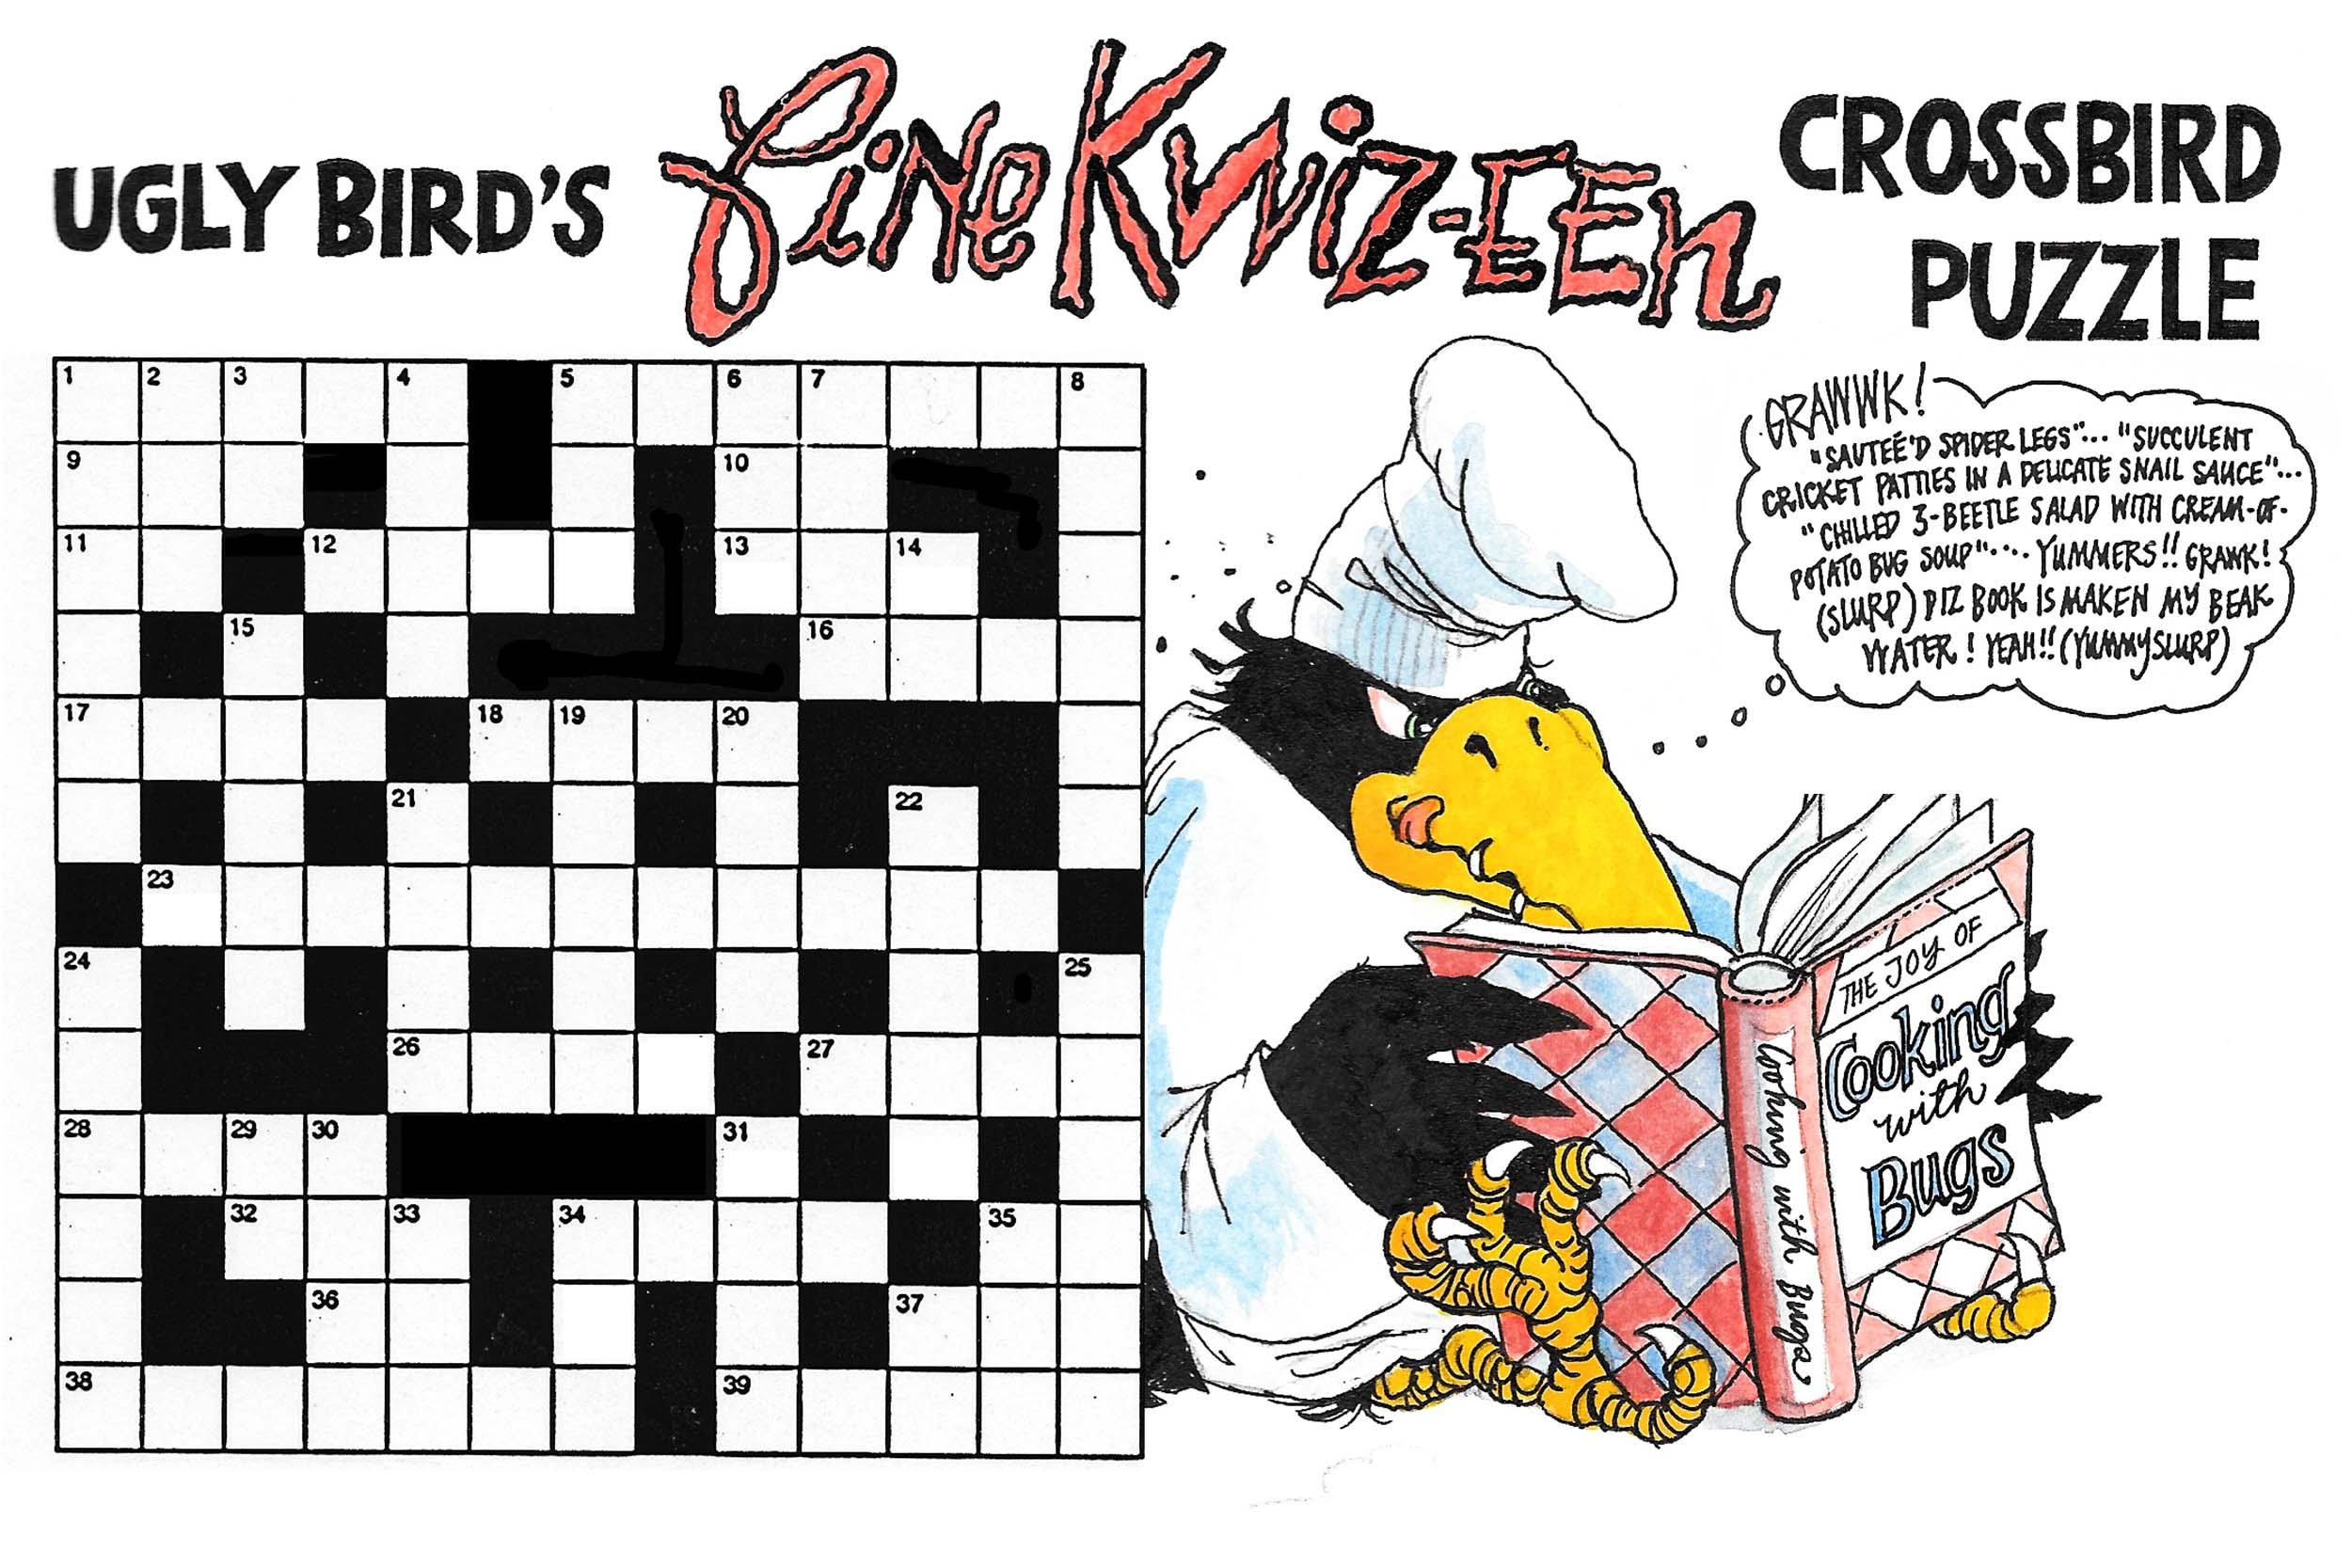 Ugly Bird's Fine Kwiz-een Puzzle